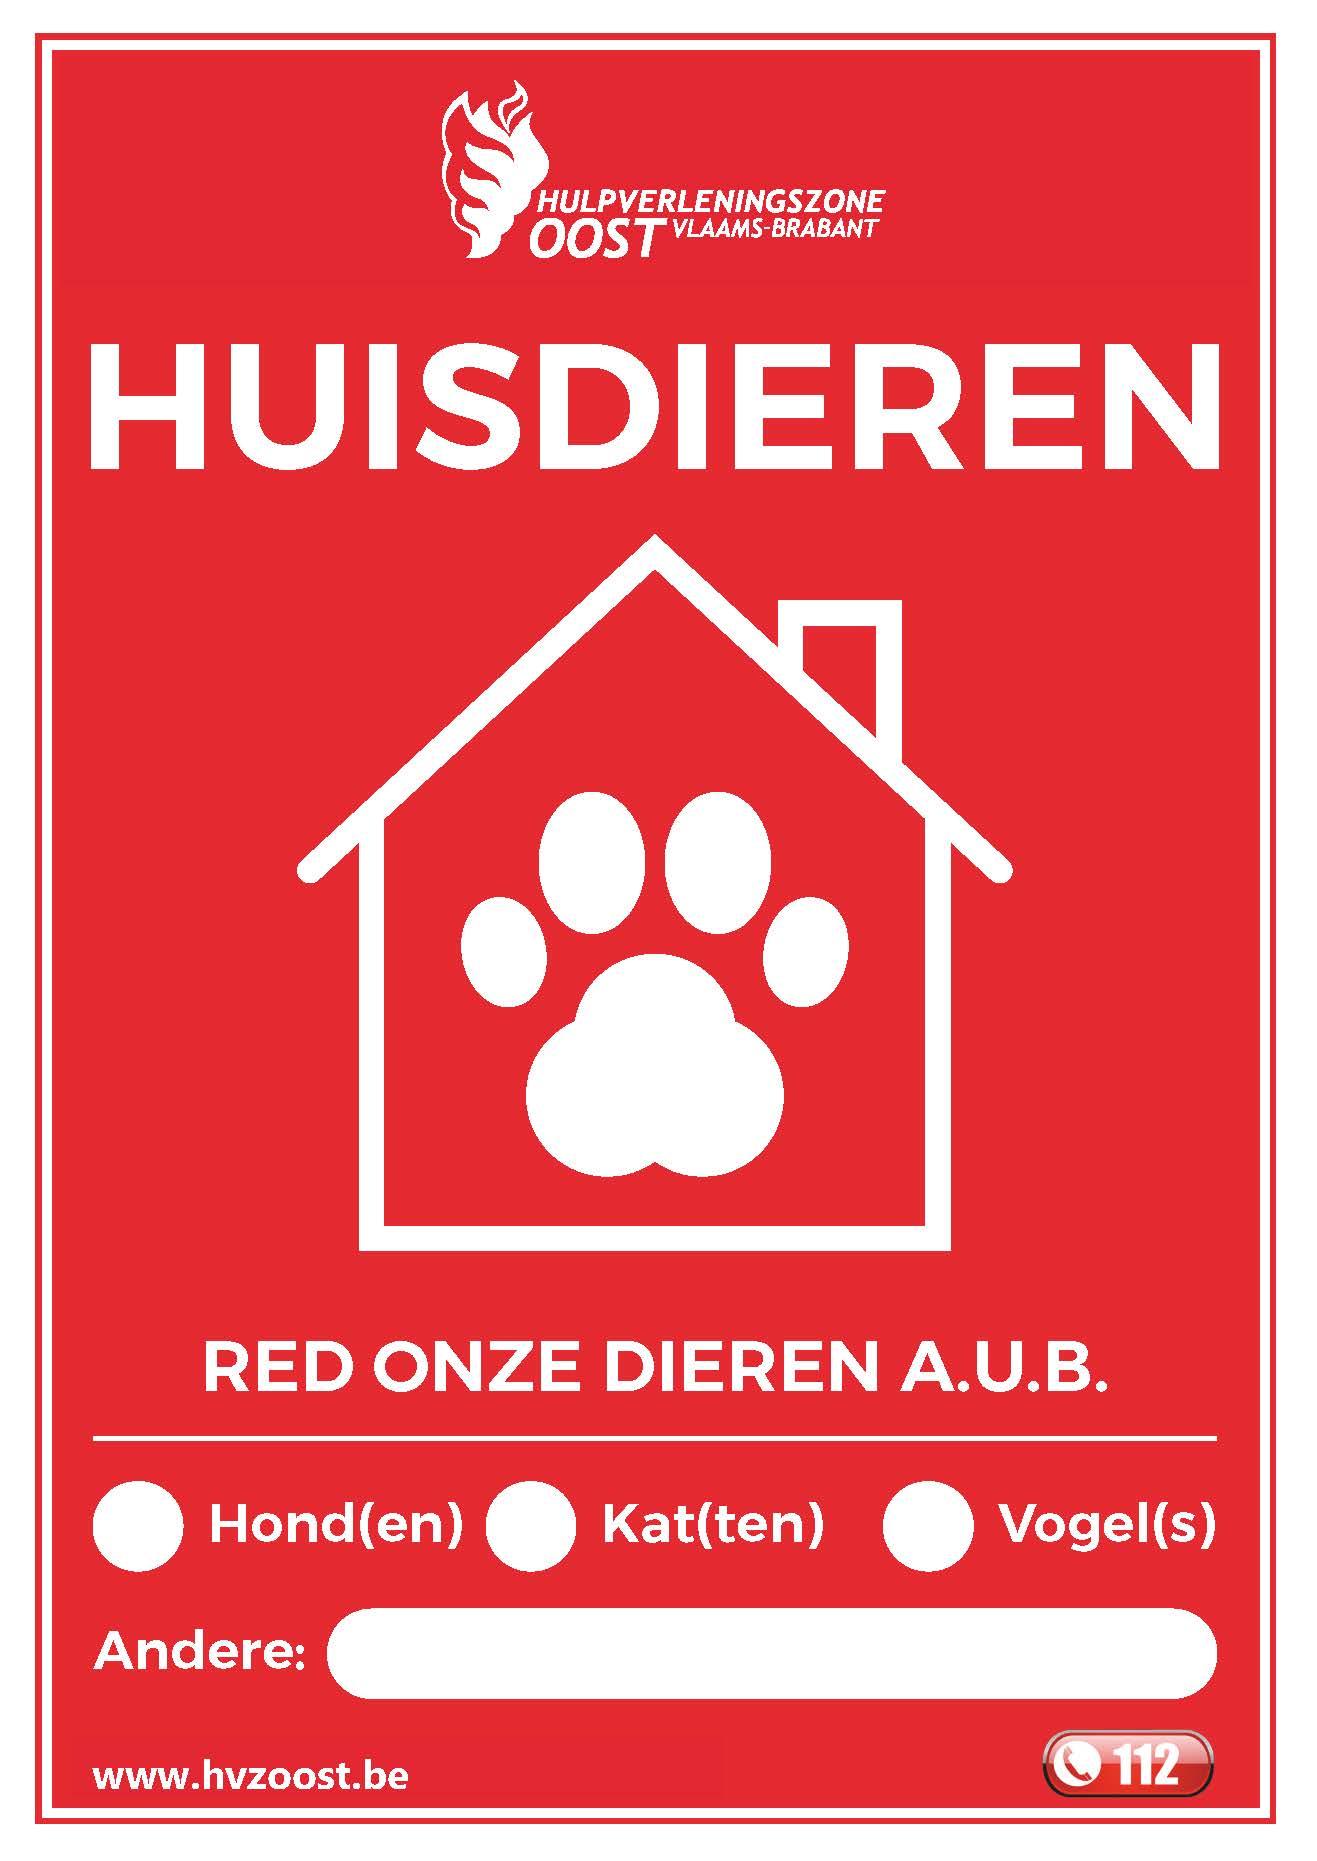 Huisdiersticker Hulpverleningszone Oost-Brabant